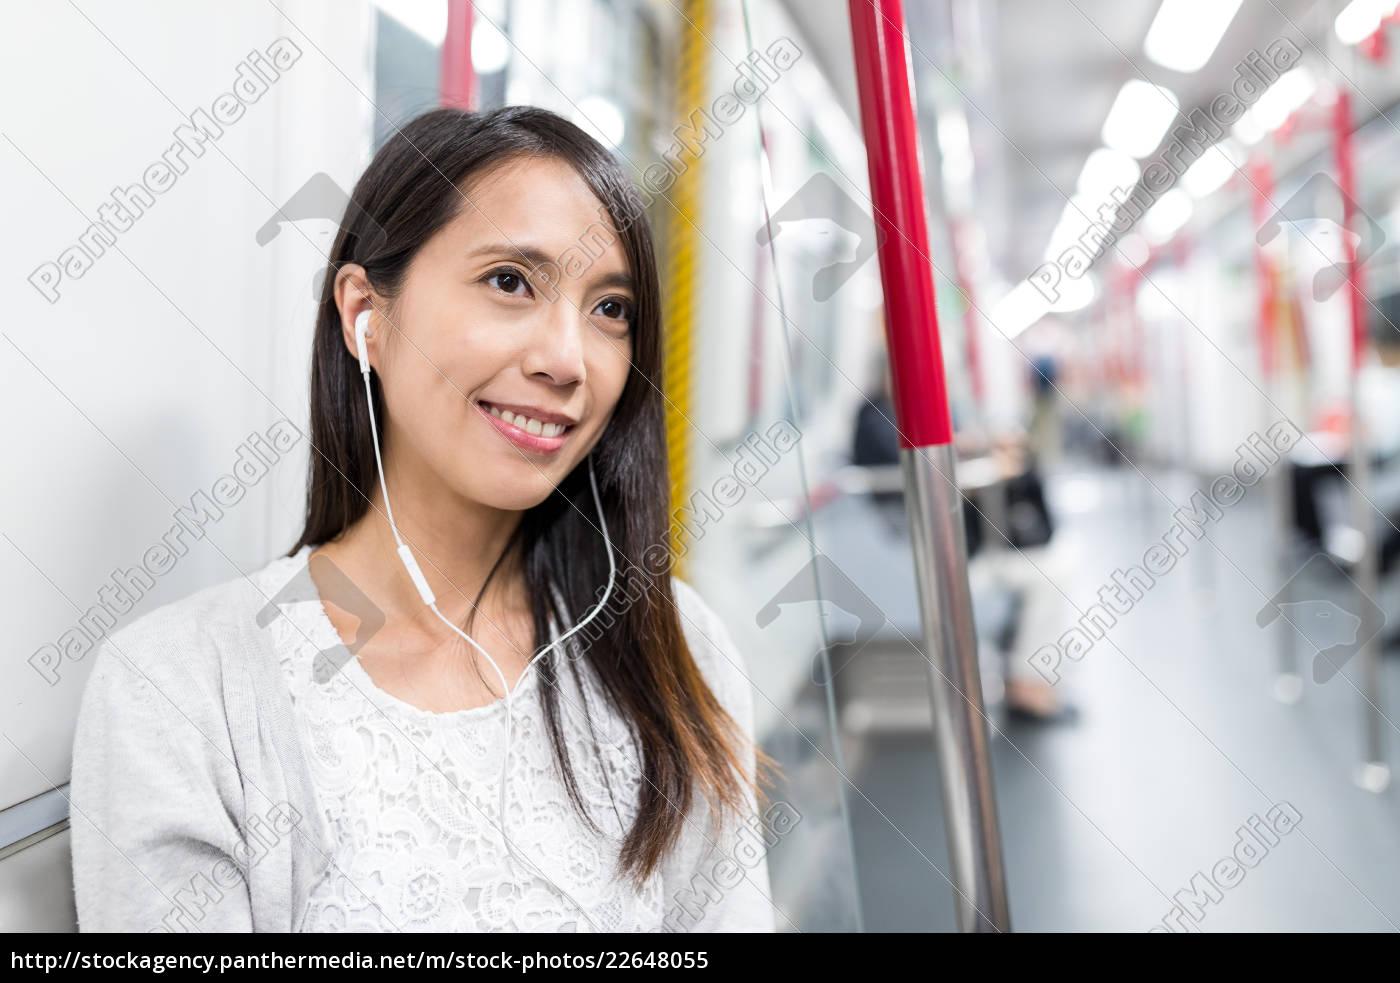 woman, listen, to, music, on, train - 22648055